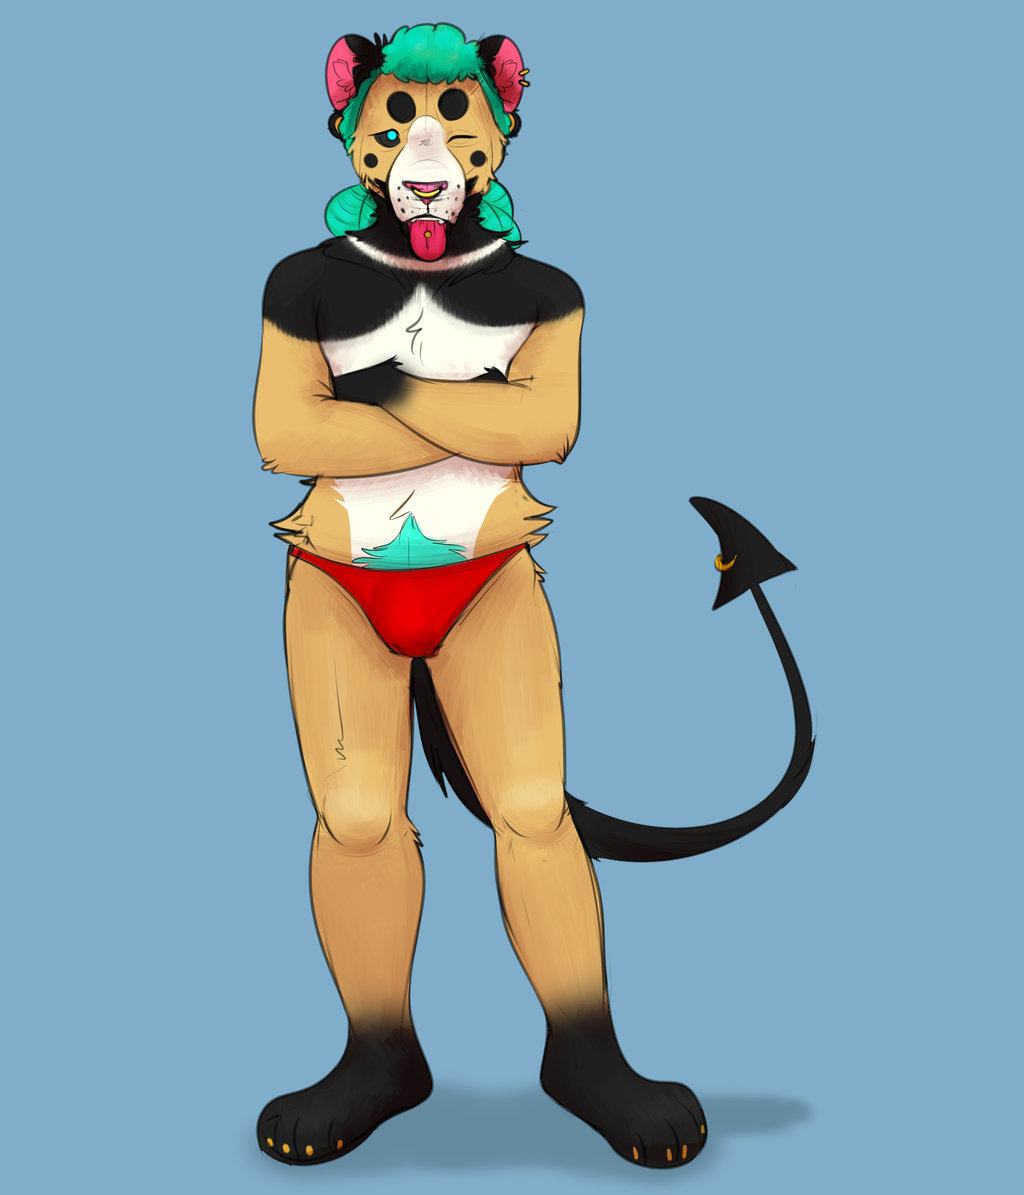 Most recent image: BUFF LION MAN